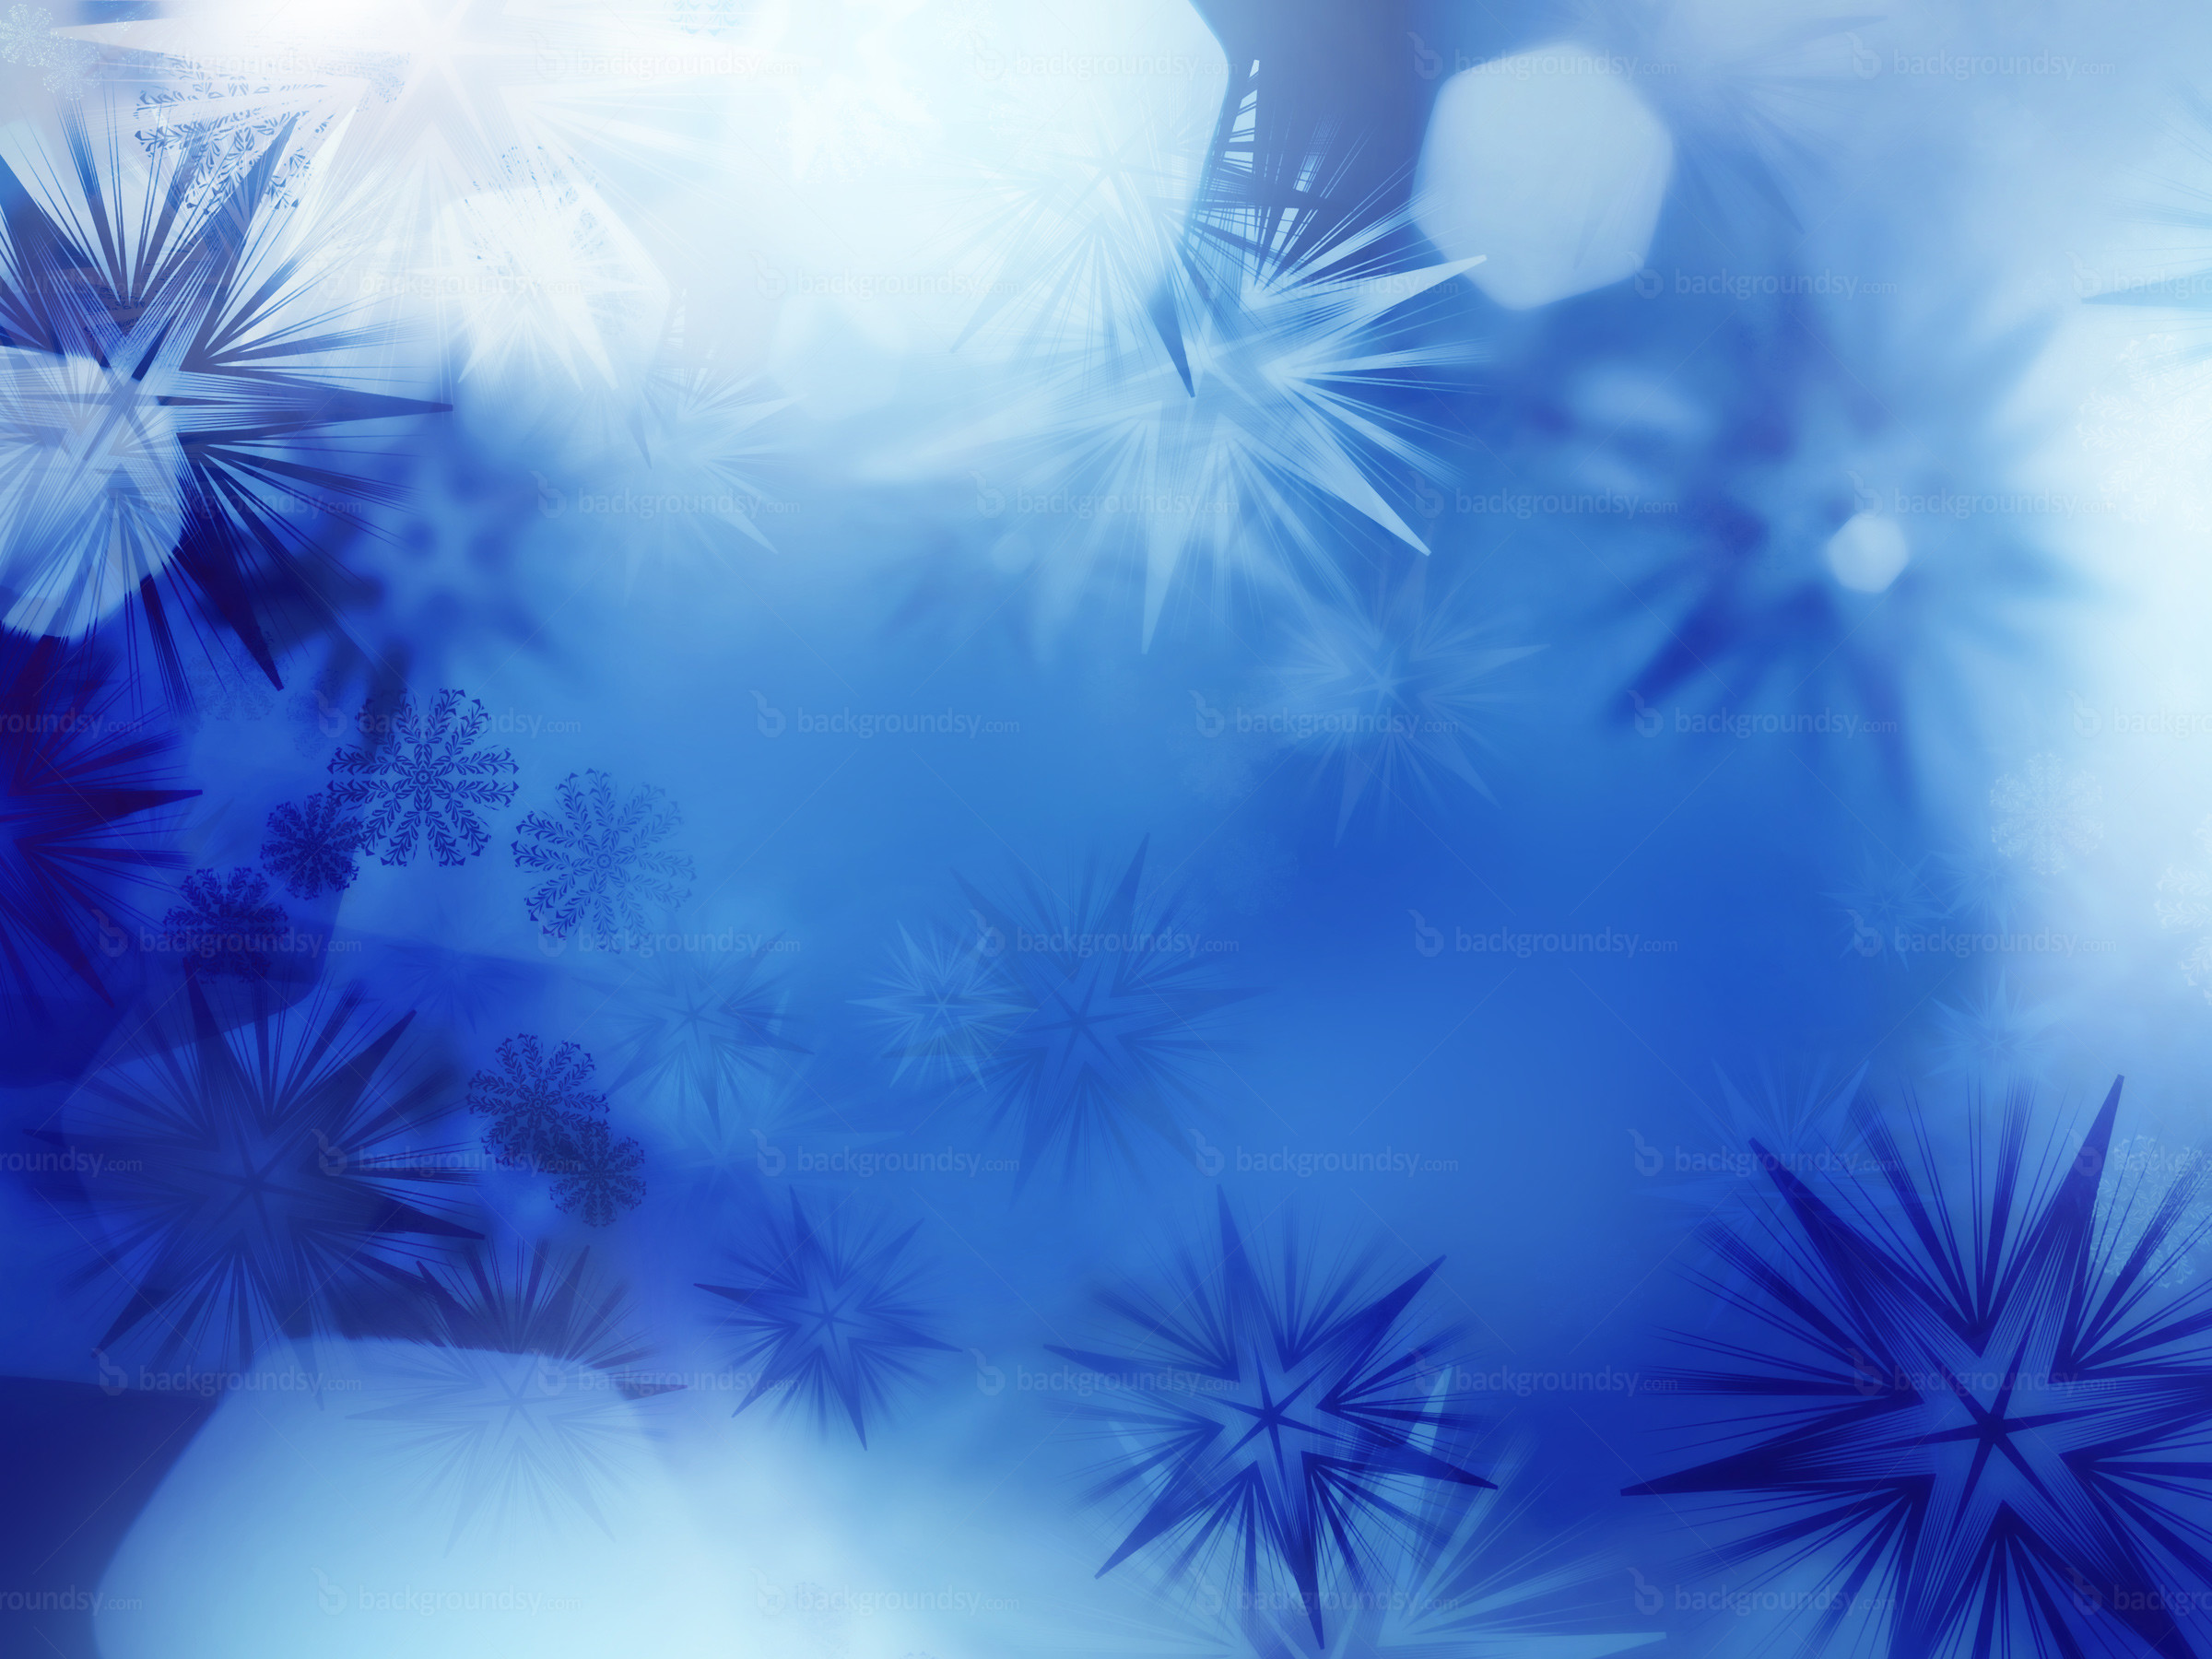 Snow HD Wallpapers Backgrounds Wallpaper 1920×1080 Pictures Of Snow  Wallpapers (25 Wallpapers) | Adorable Wallpapers | Desktop | Pinterest |  Snow pictures, …